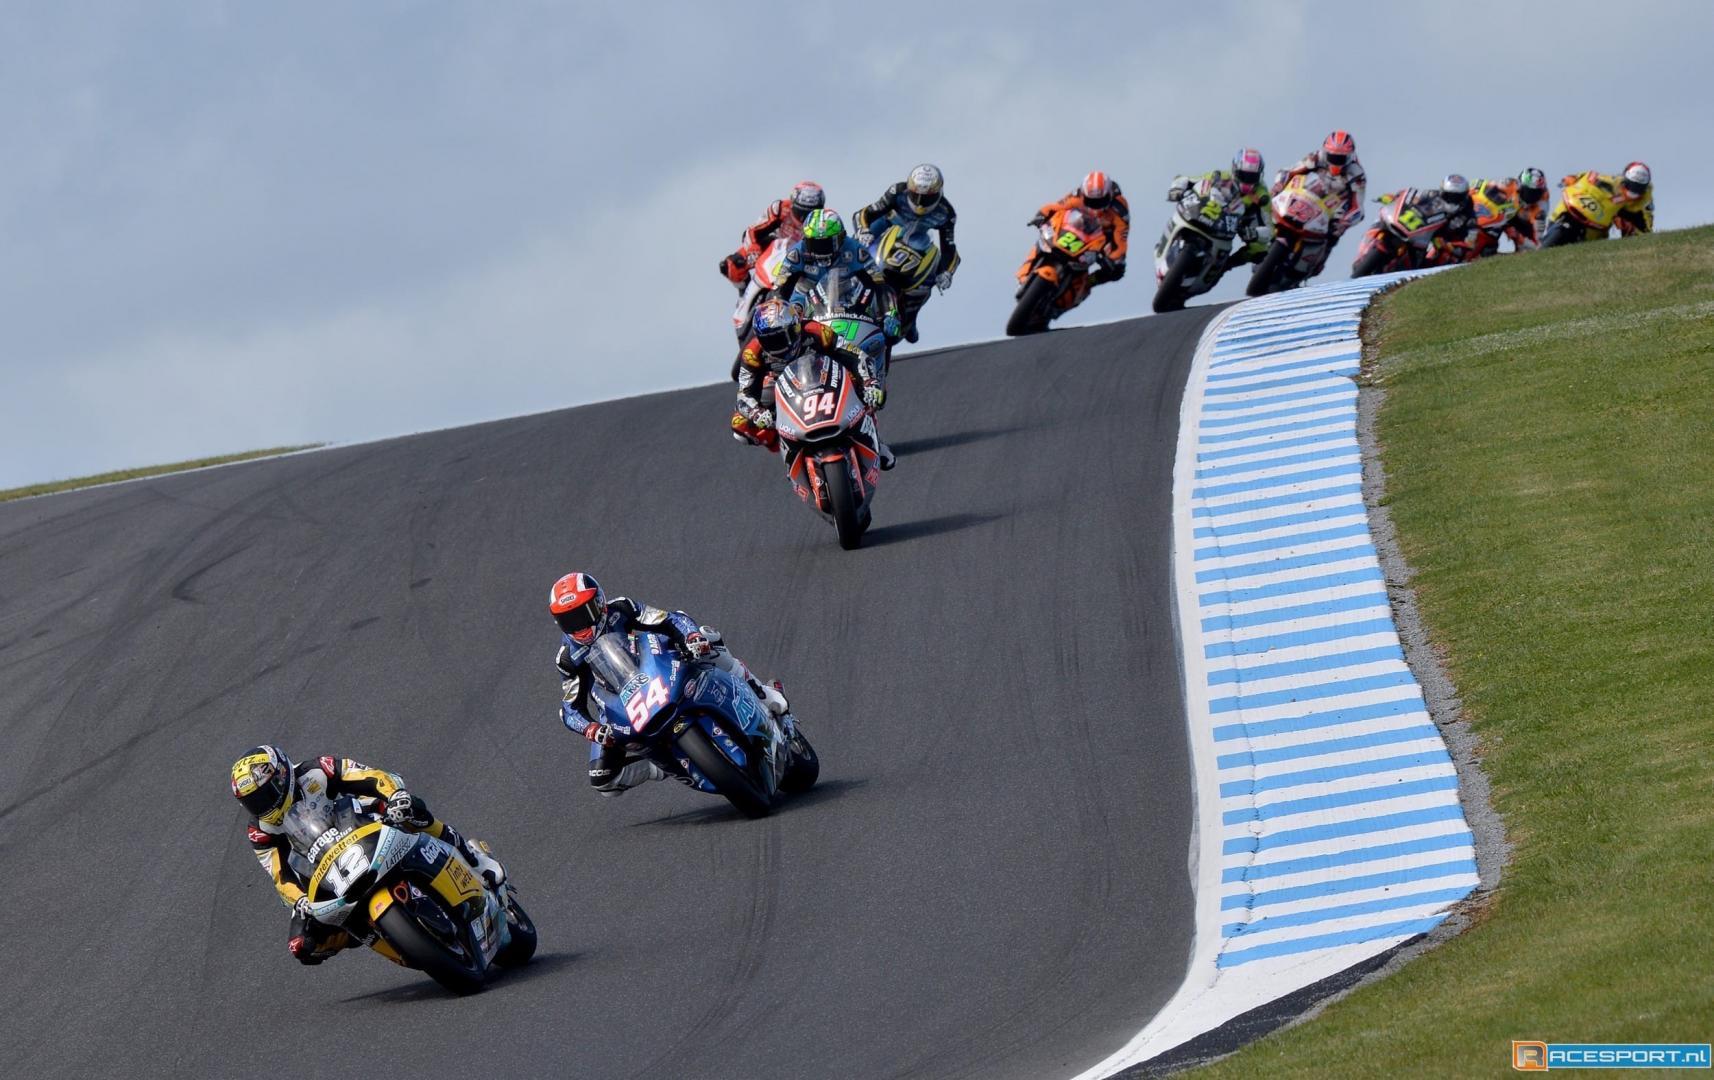 Moto2 race Phillip Island